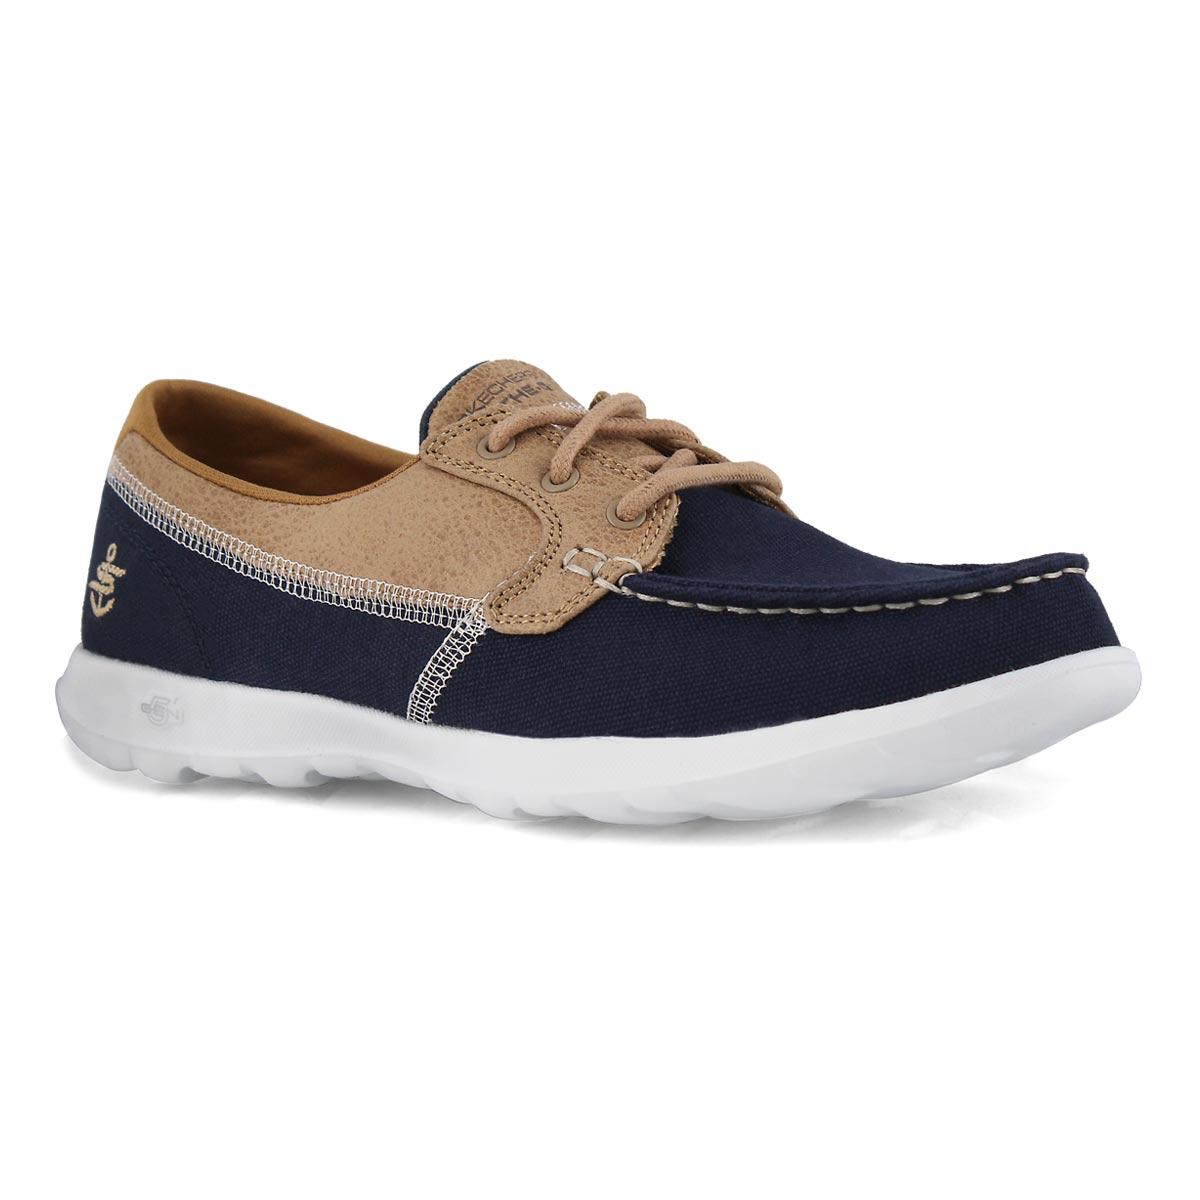 Lds GOwalk Lite Coral navy boat shoe